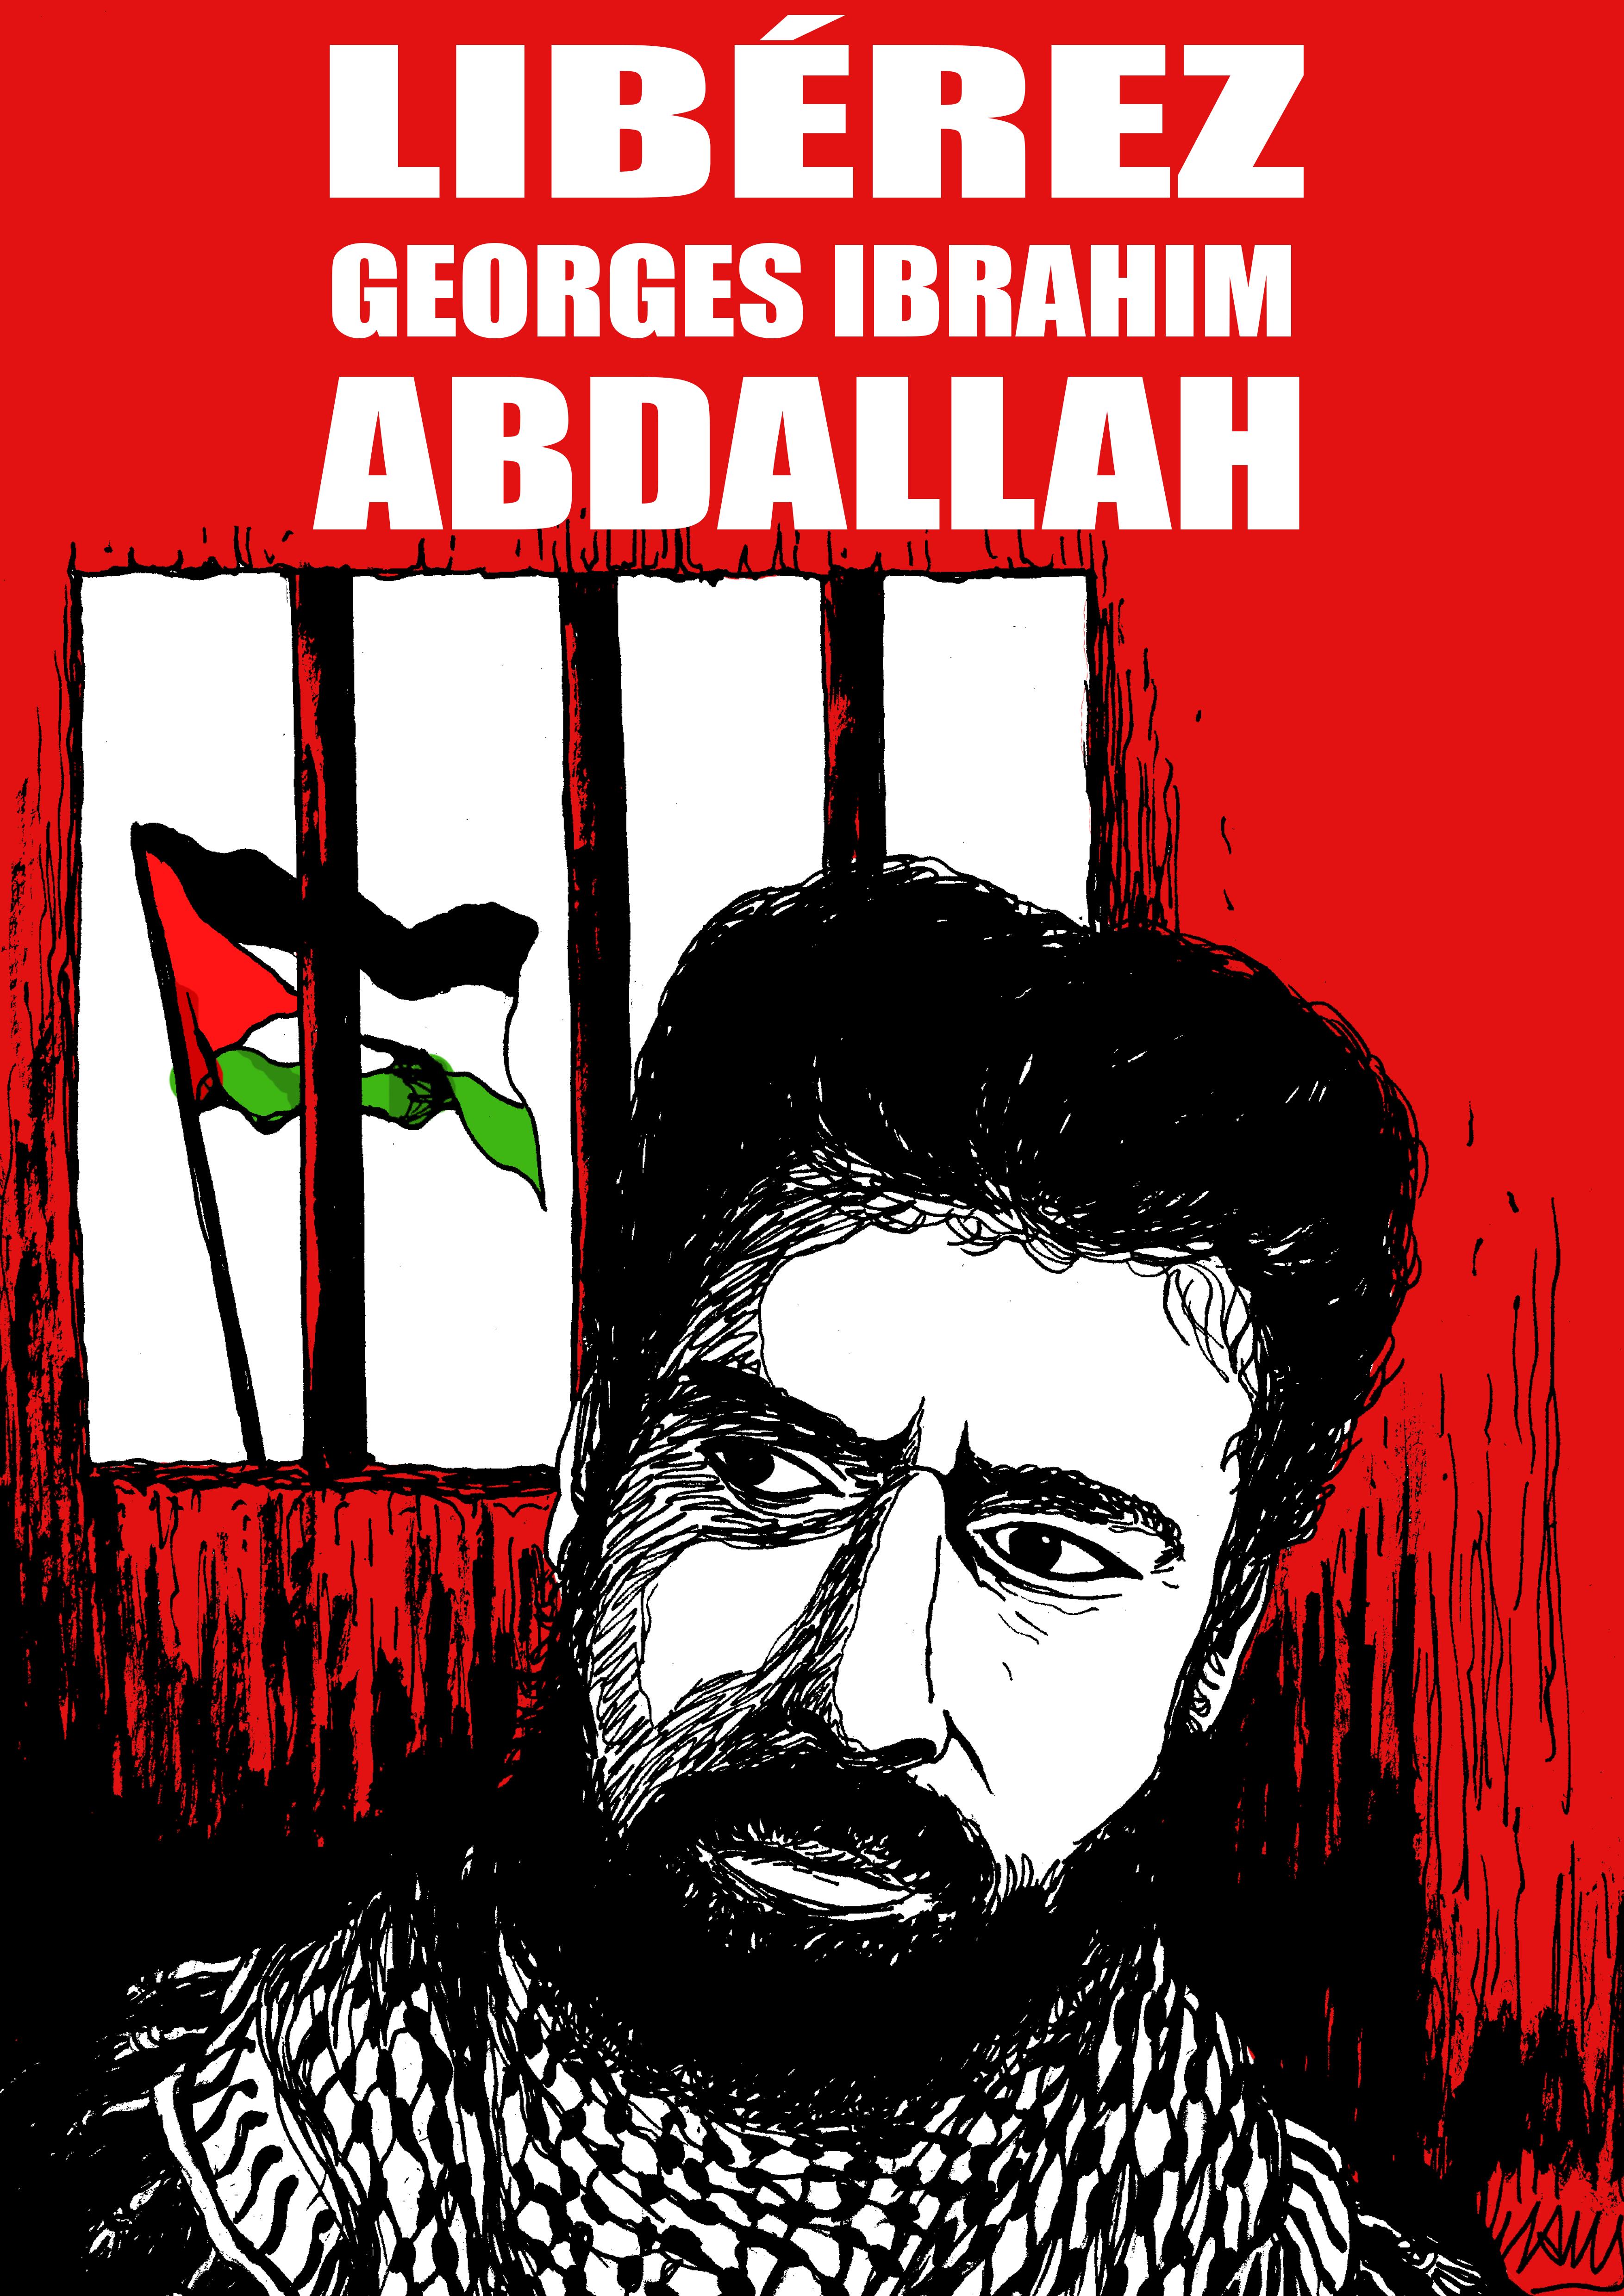 georges_abdallah_manu_scordia.jpg